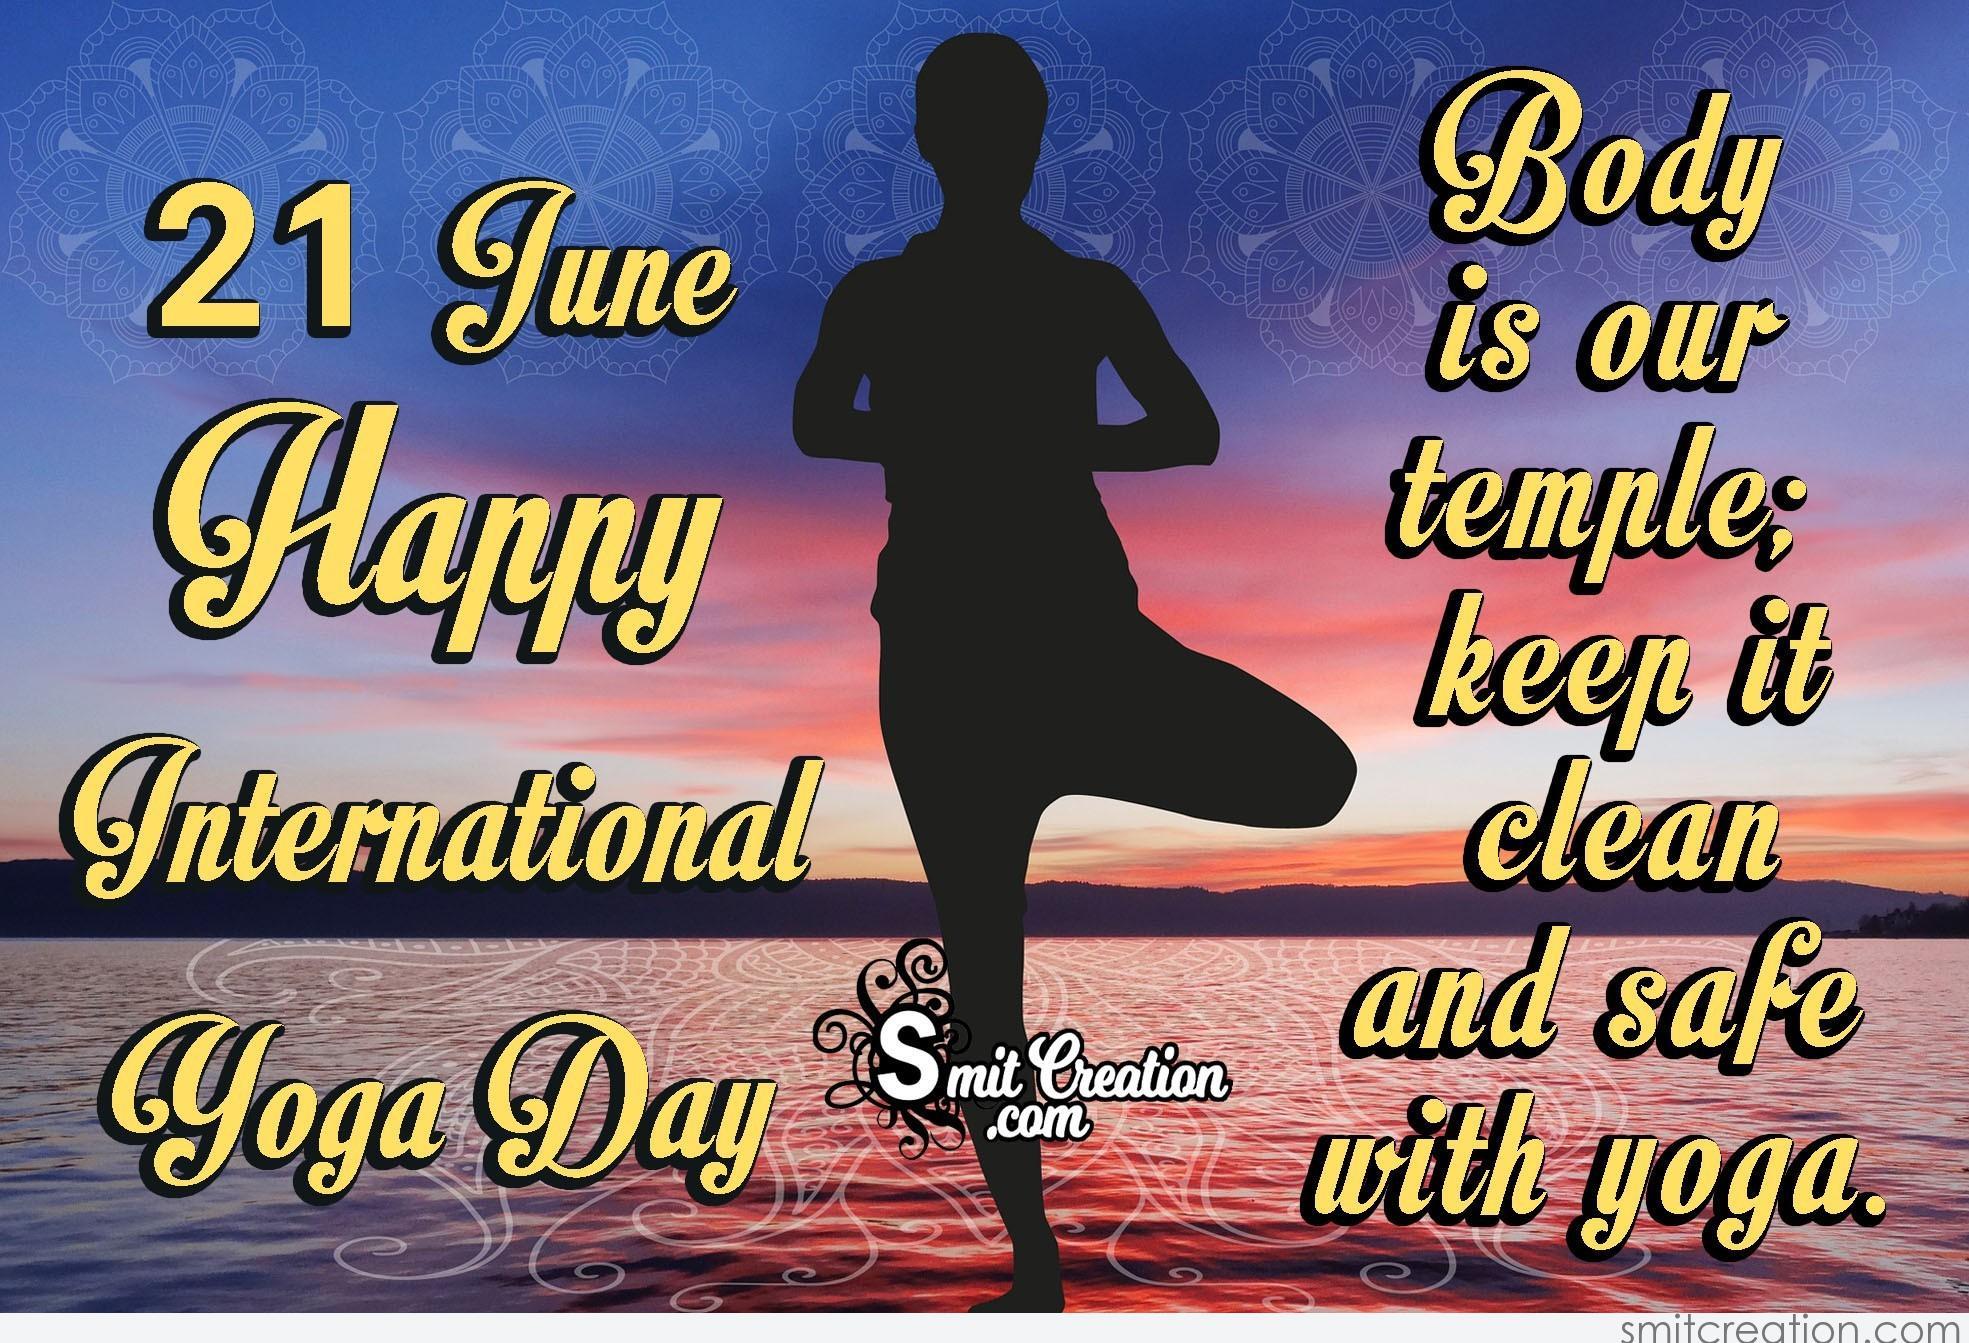 21 June Happy International Yoga Day Smitcreation Com